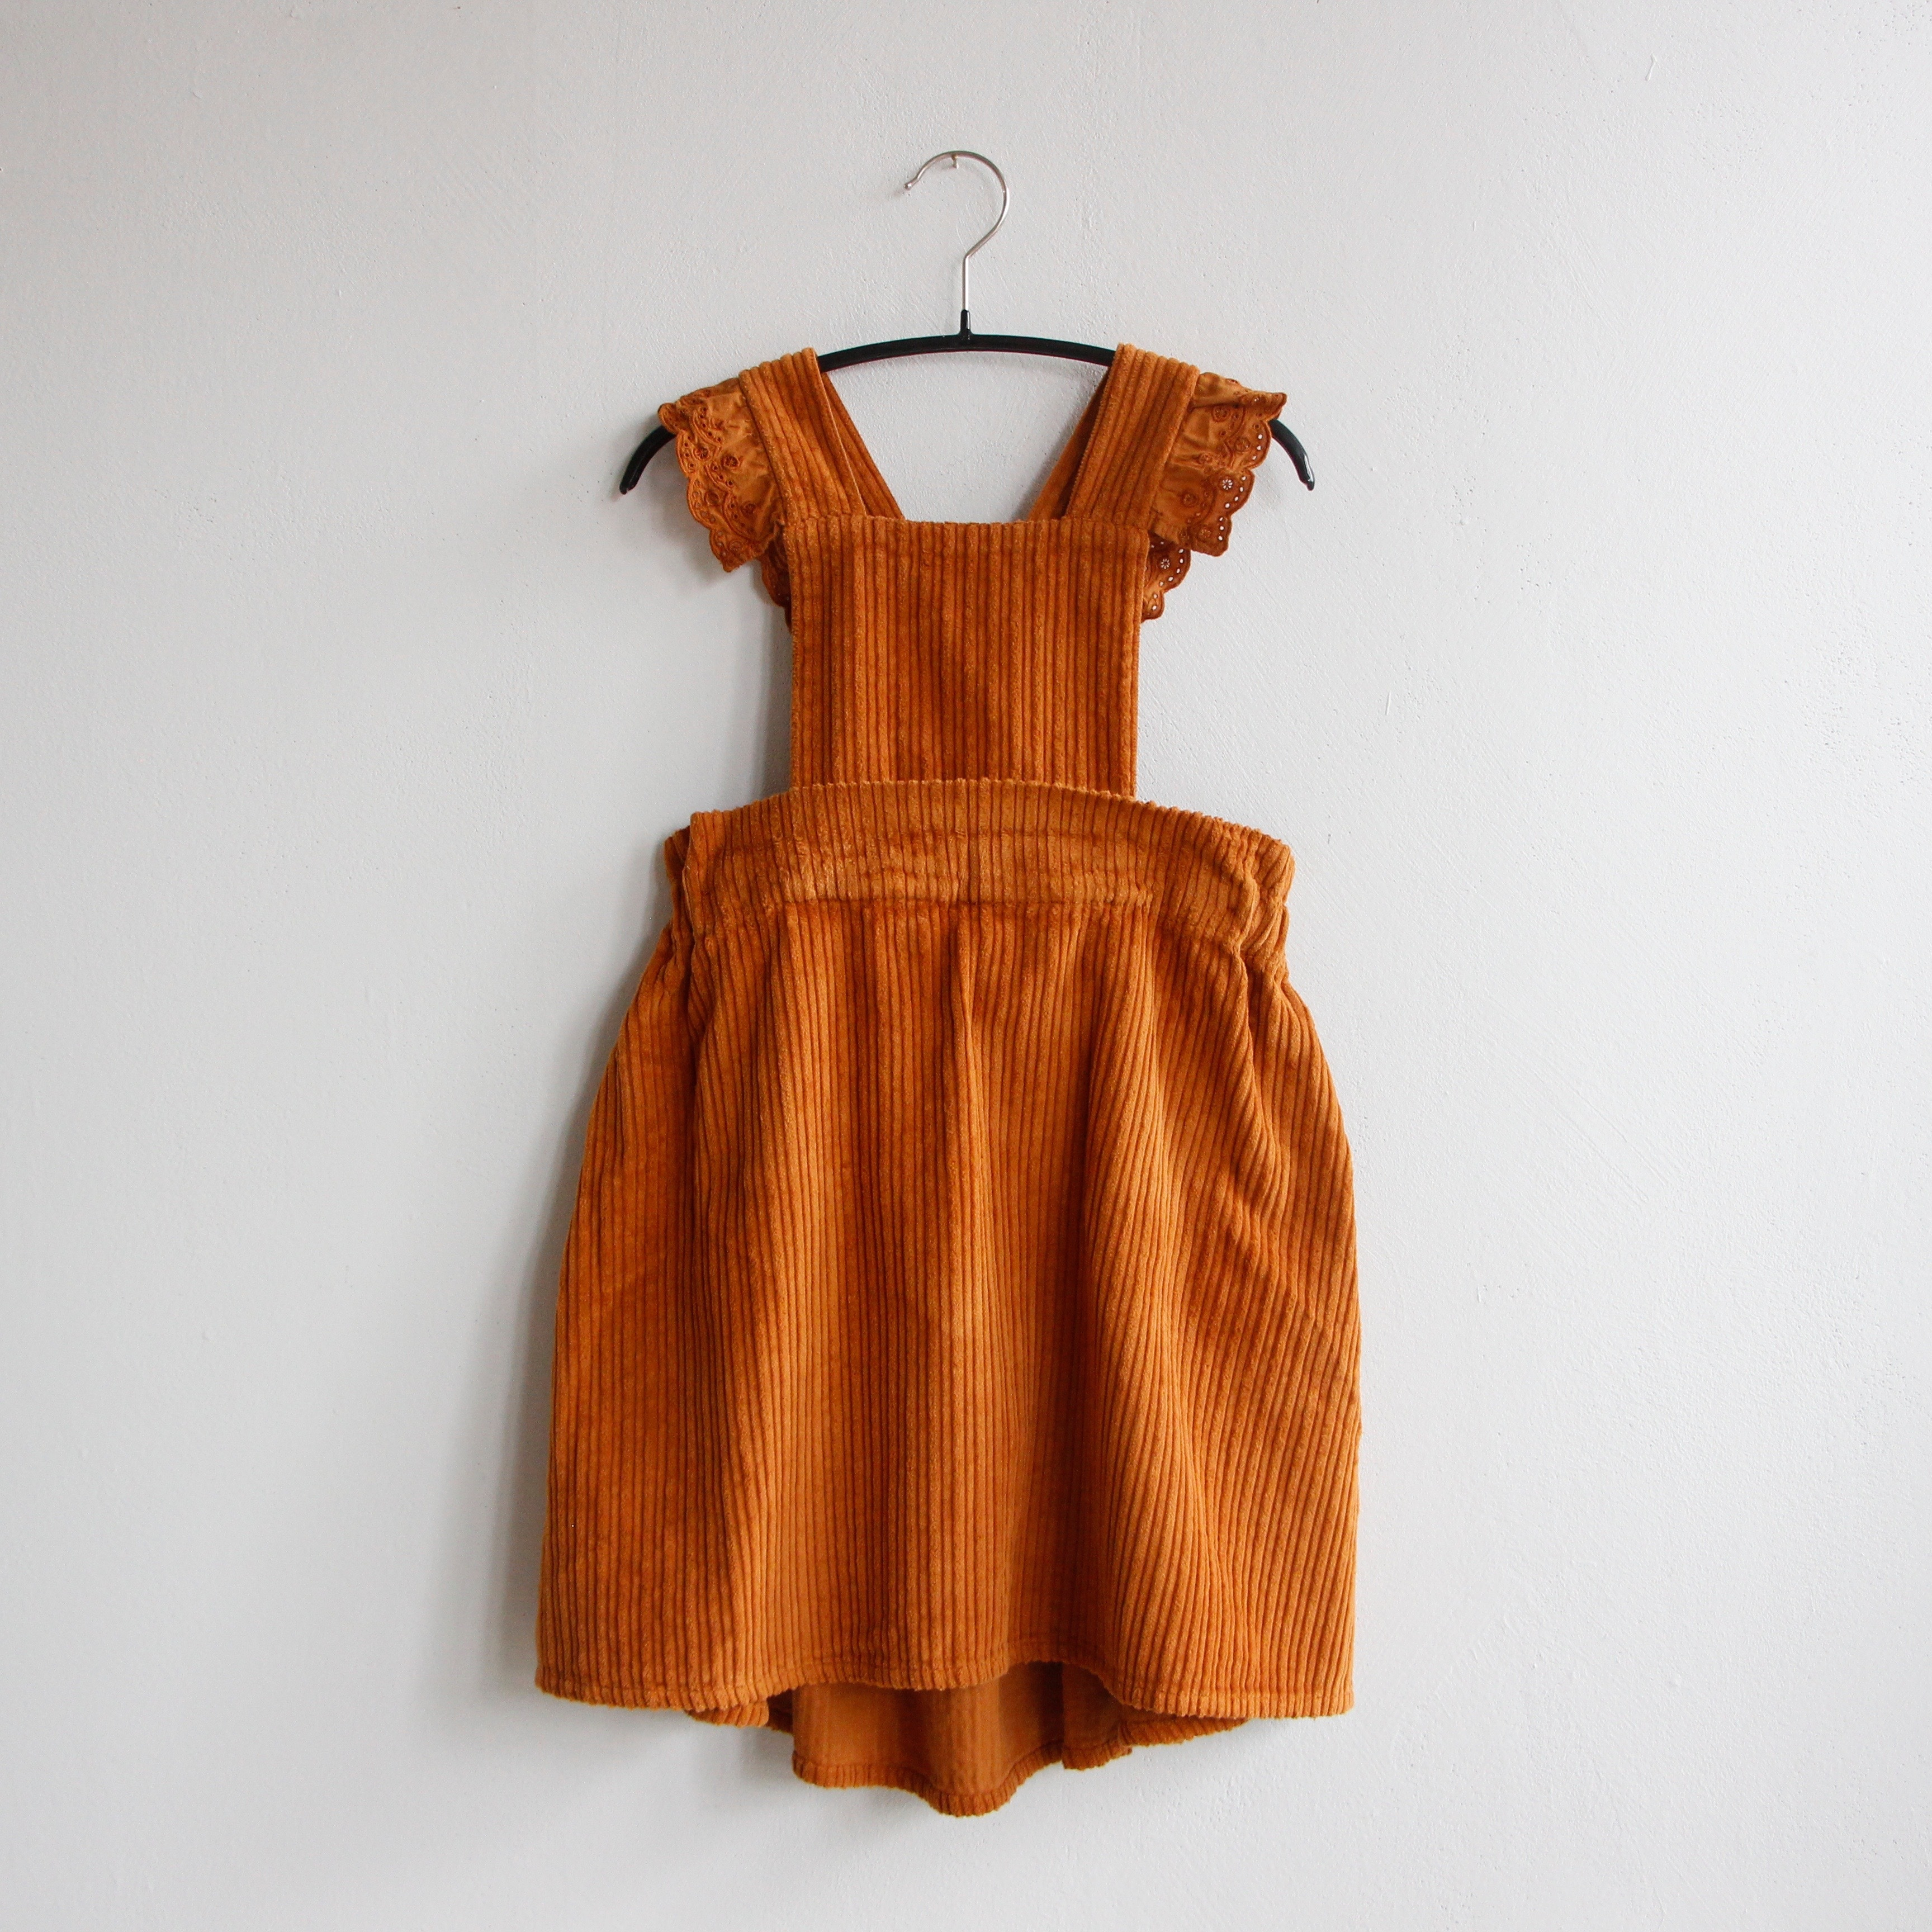 《WOLF & RITA 2020AW》CARMEN dress / corduroy orange